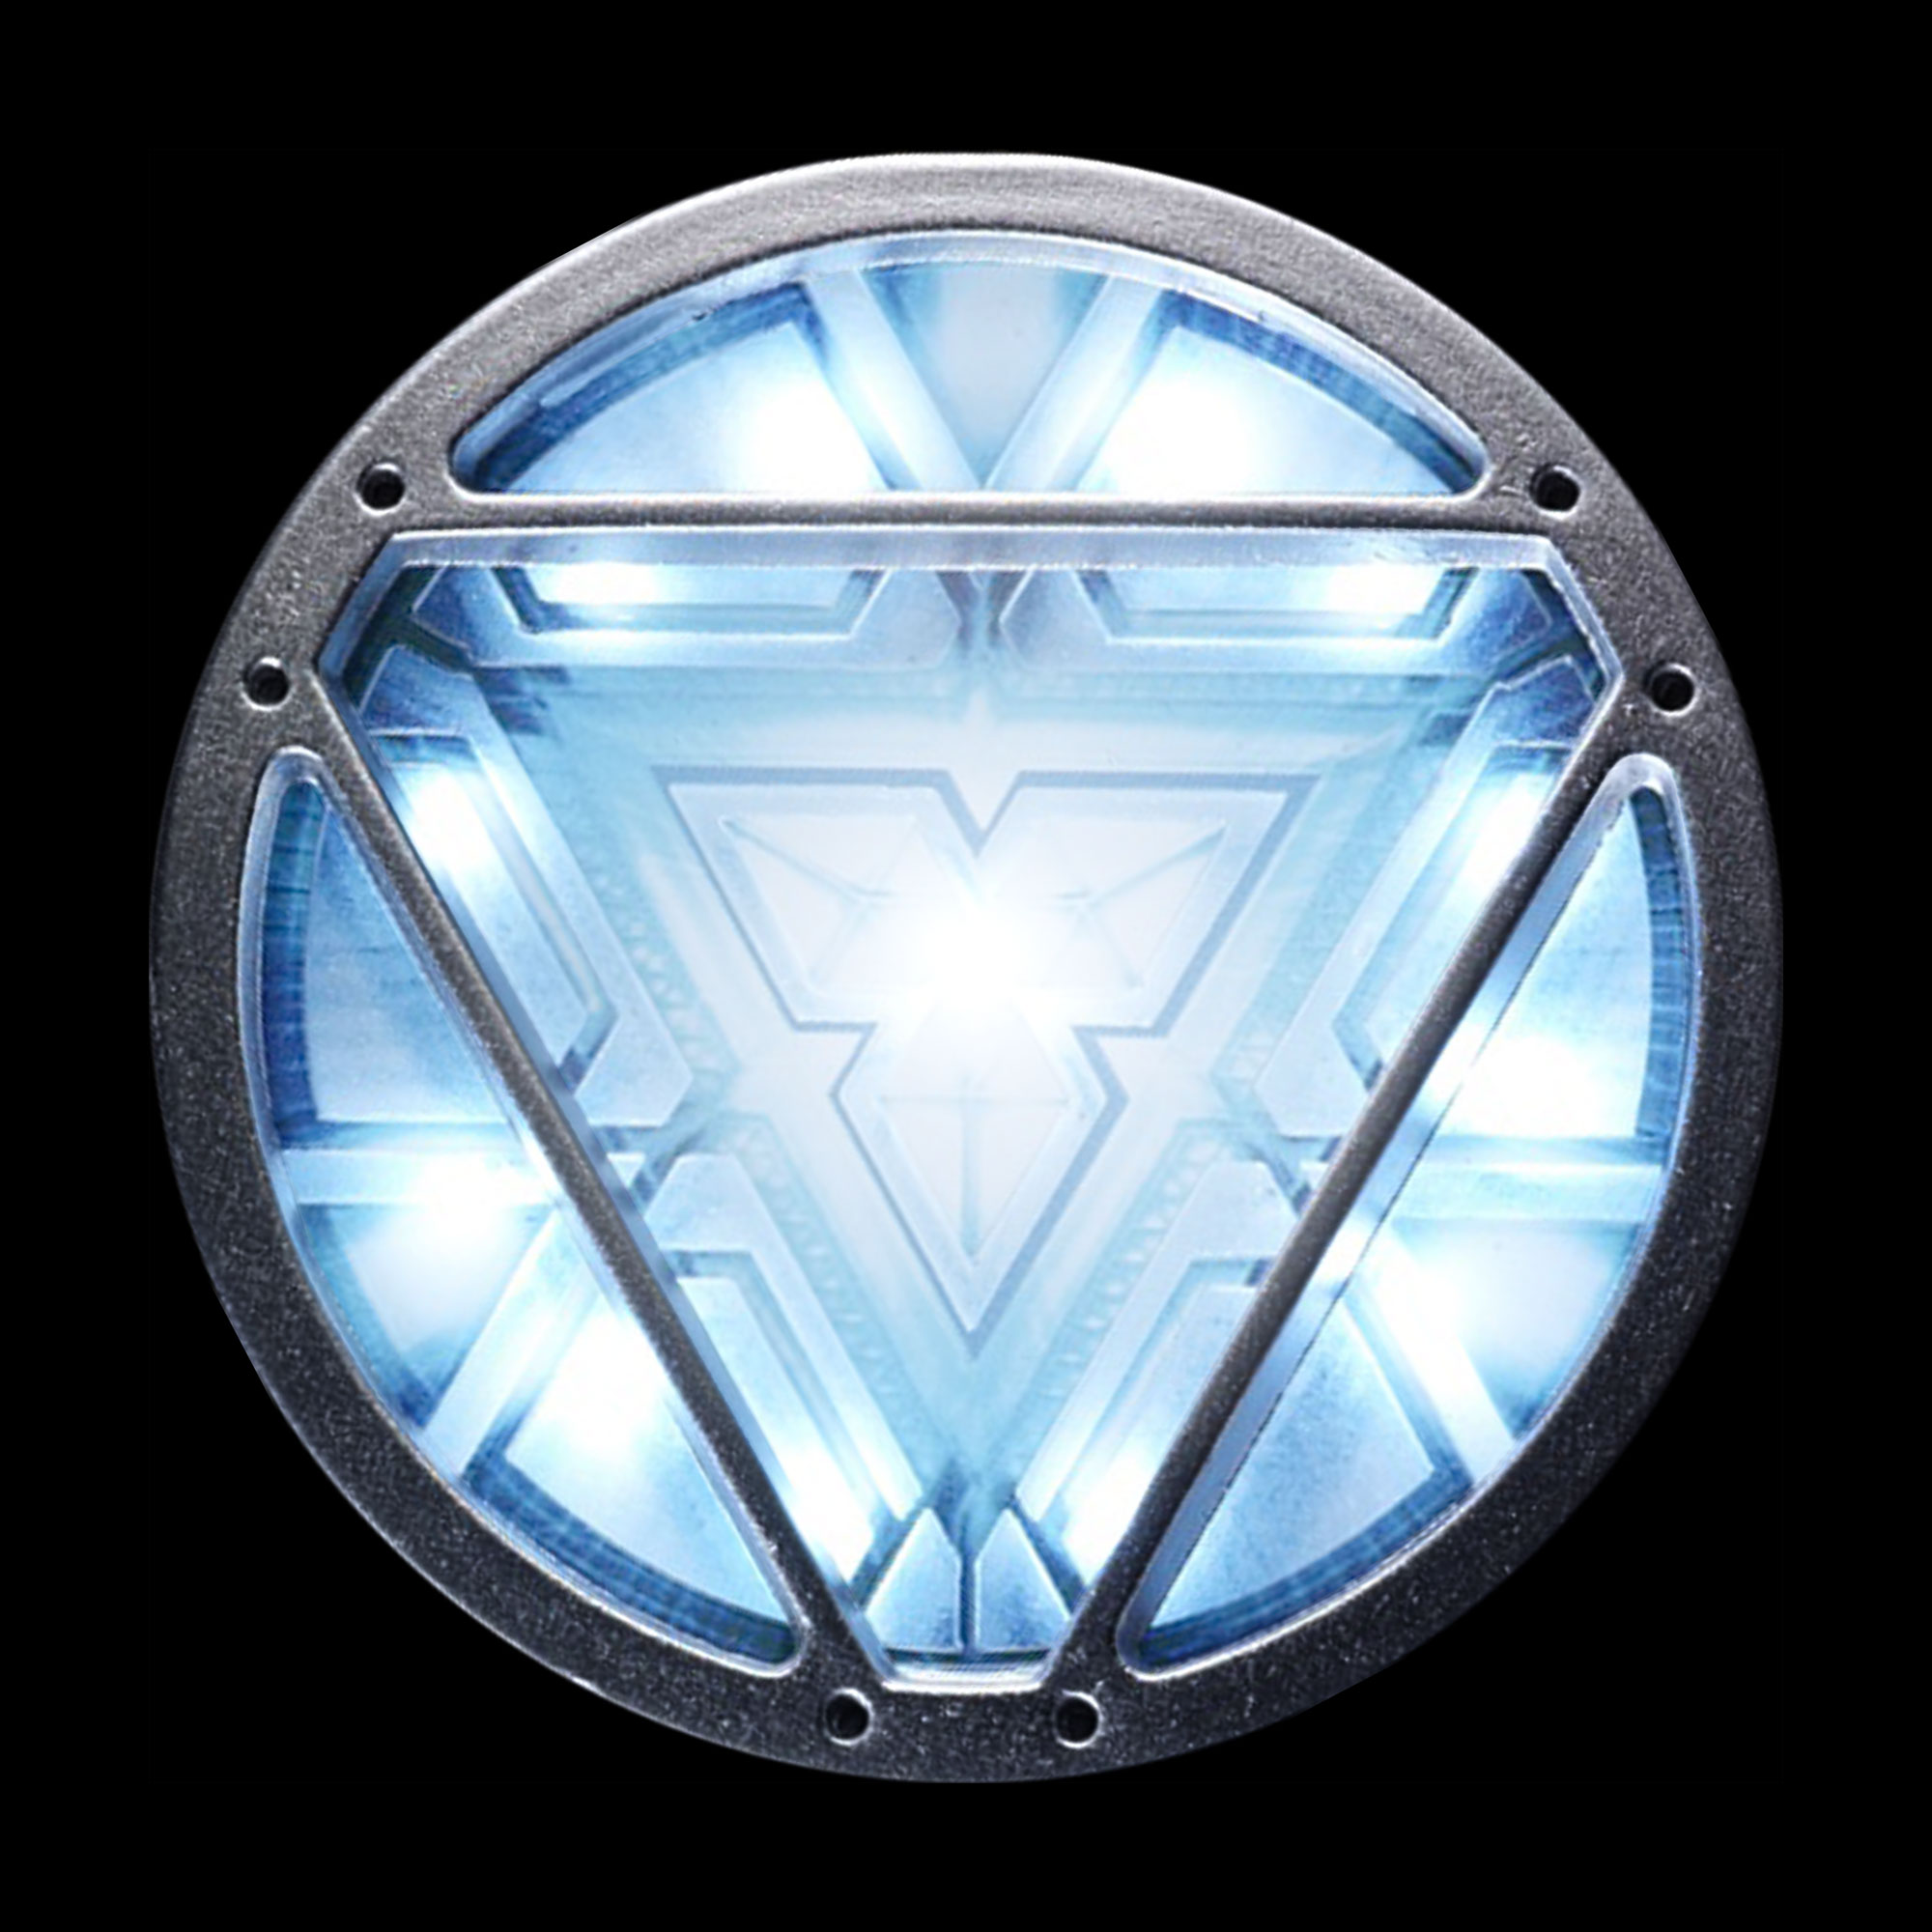 Iron Man Mark VI custom arc reactor symbol